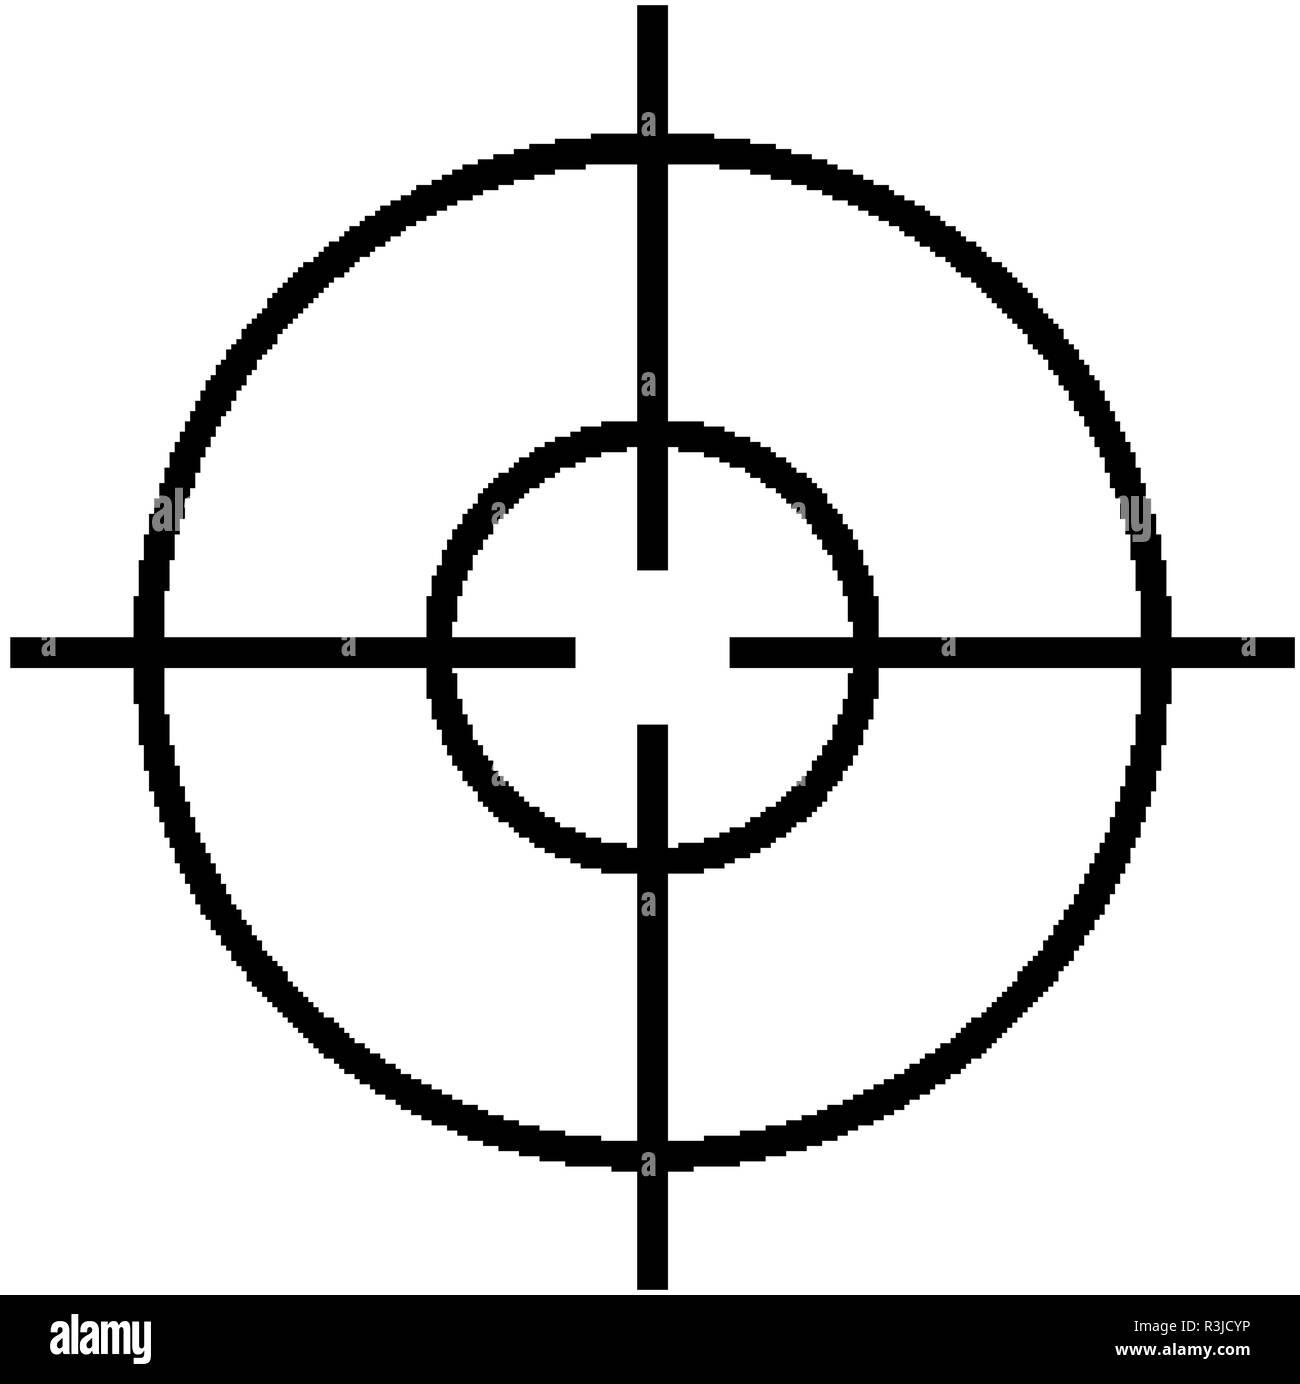 Military sniper rifle scope collimator sight icon Stock Vector